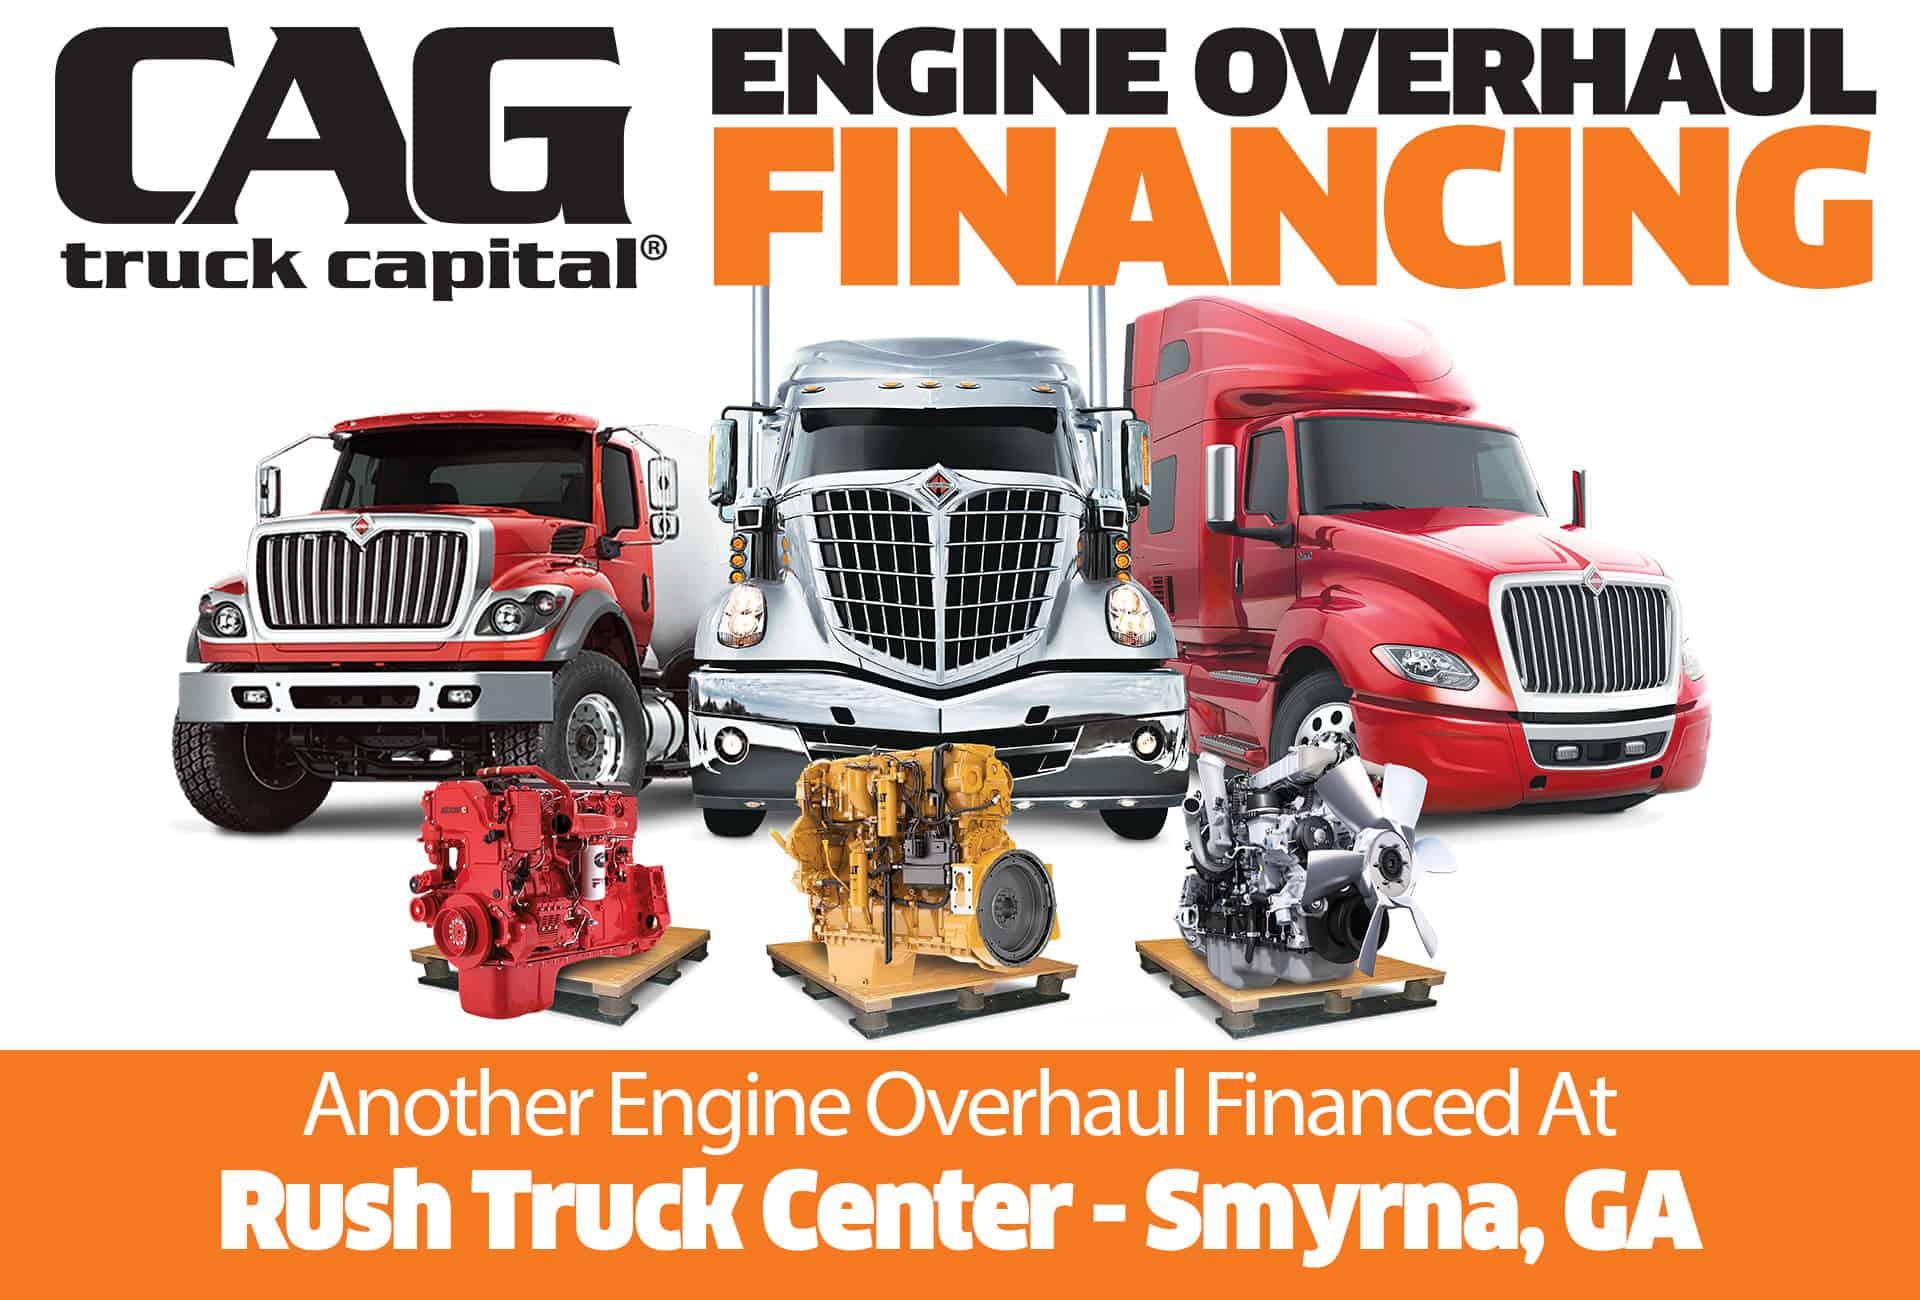 Rush Truck Center Smyrna GA